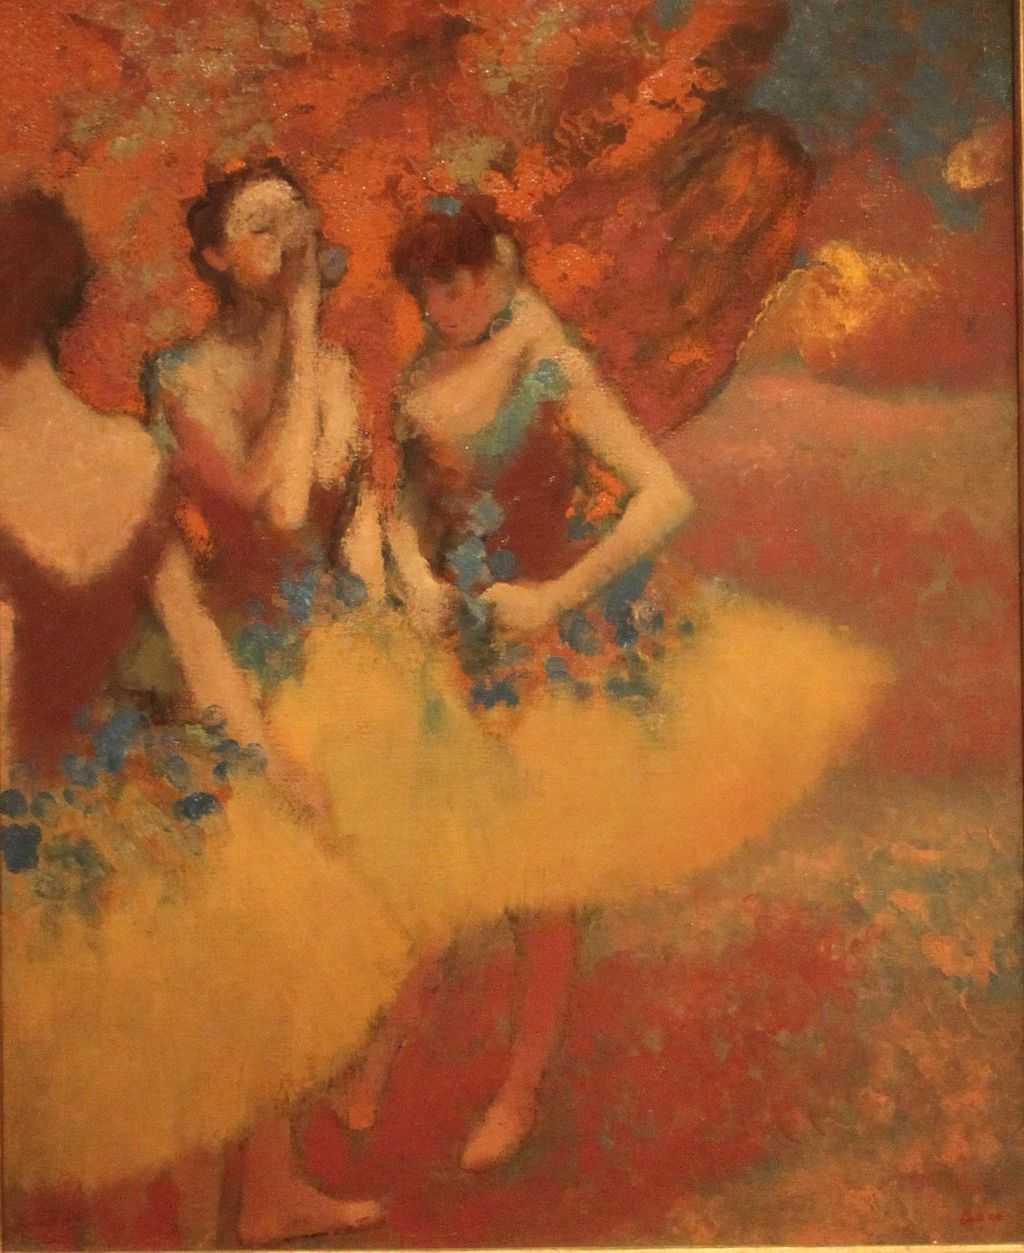 Three Dancers in Yellow Skirts Edgar Degas - Edgar Degas - Wikipedia, la enciclopedia libre